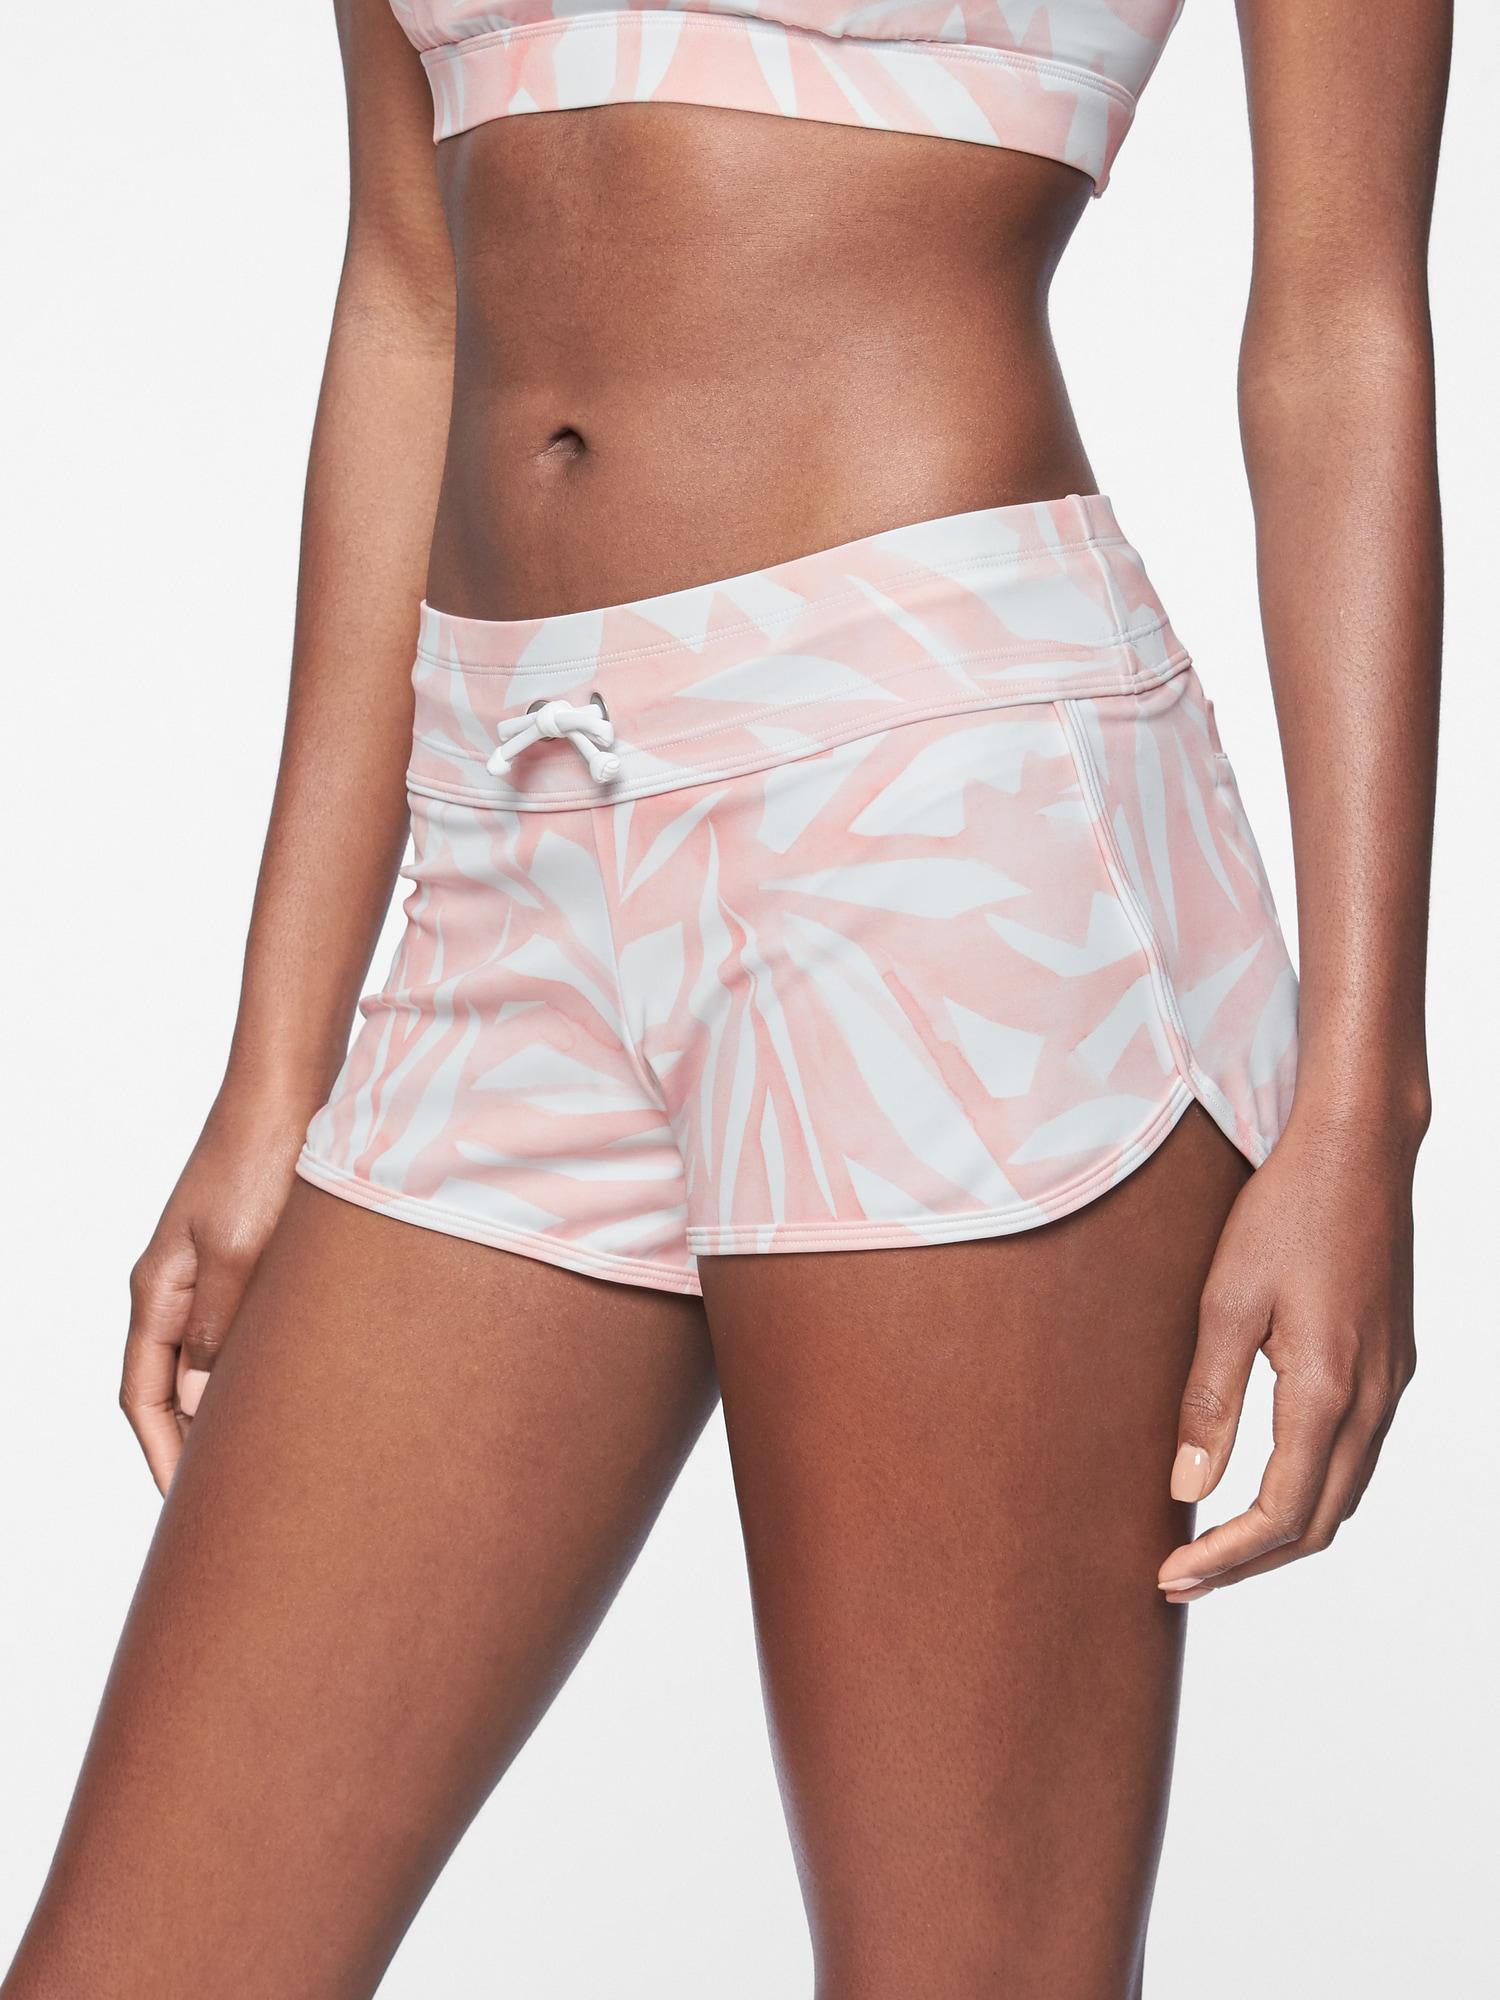 74203fe4ecf Athleta South Beach Kata Short in Pink - Lyst